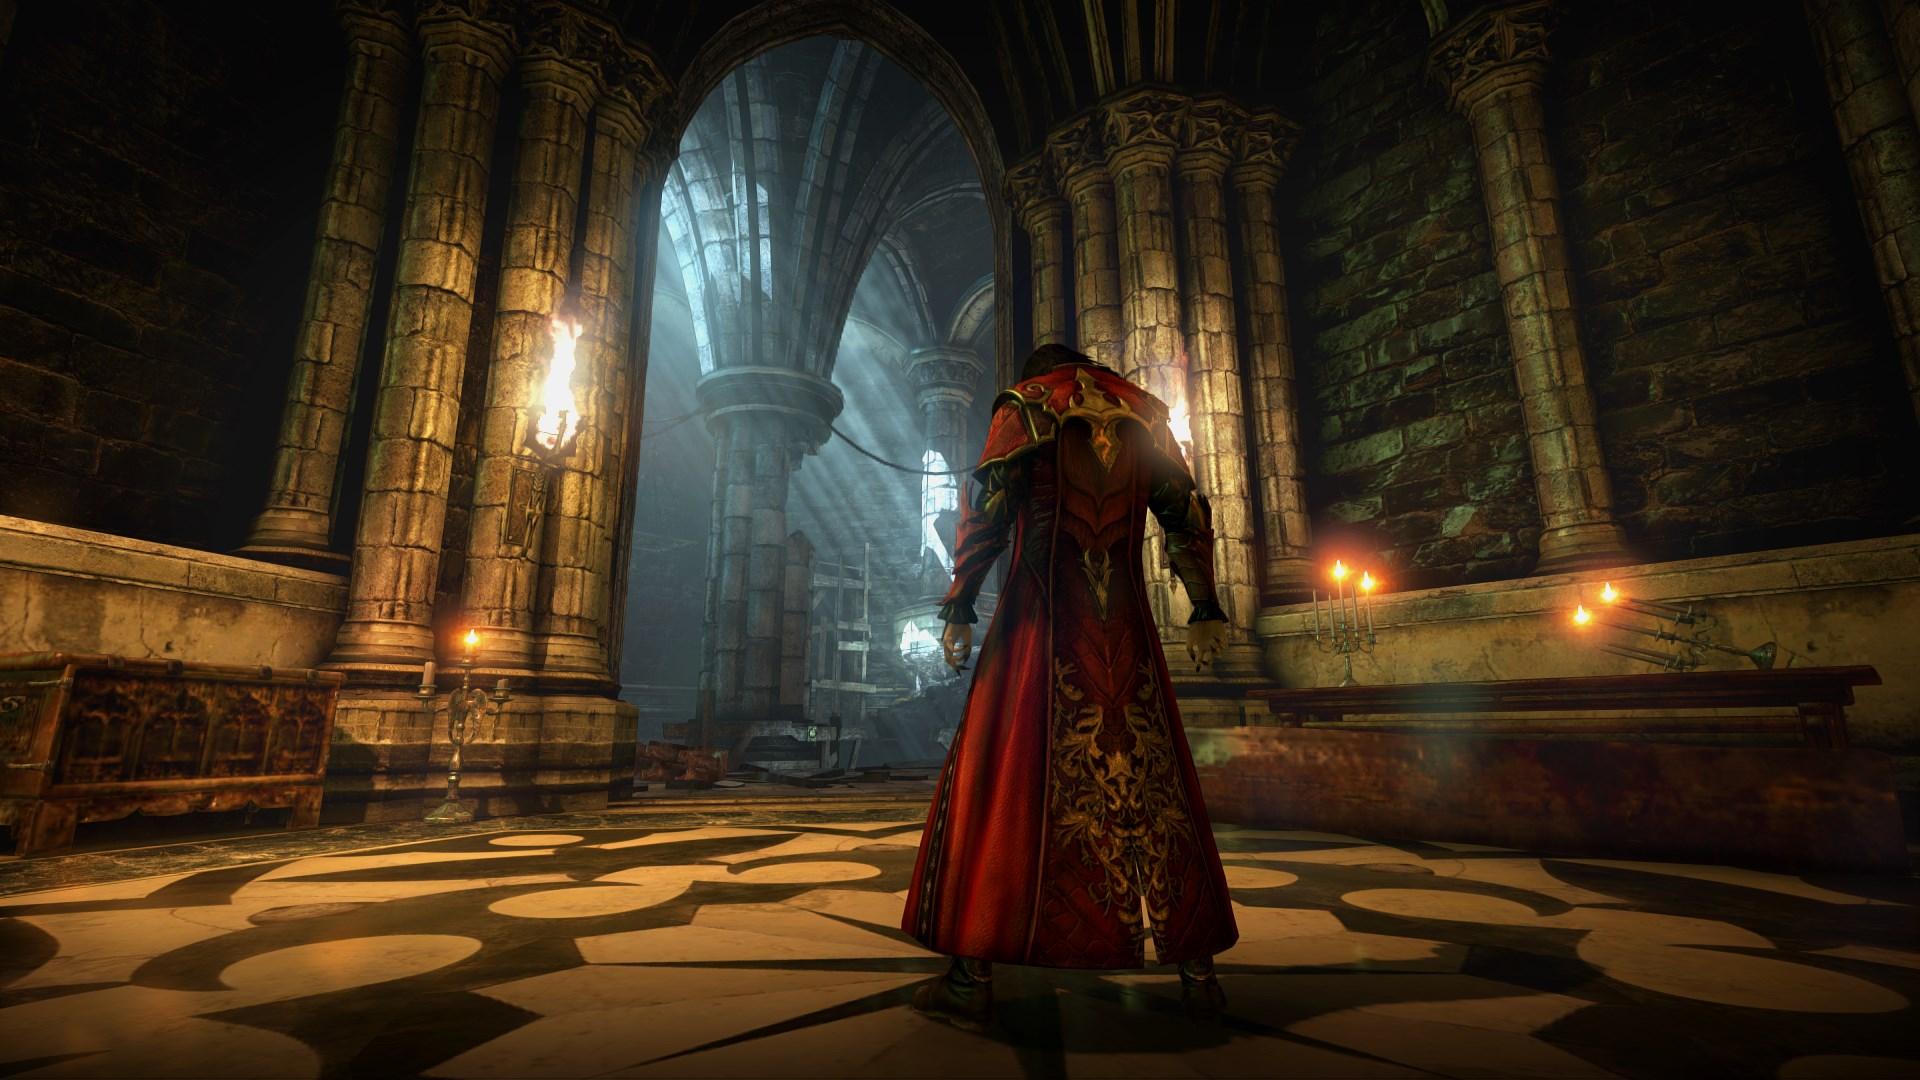 Screenshoty z Castlevania: Lords of Shadow 2 83320